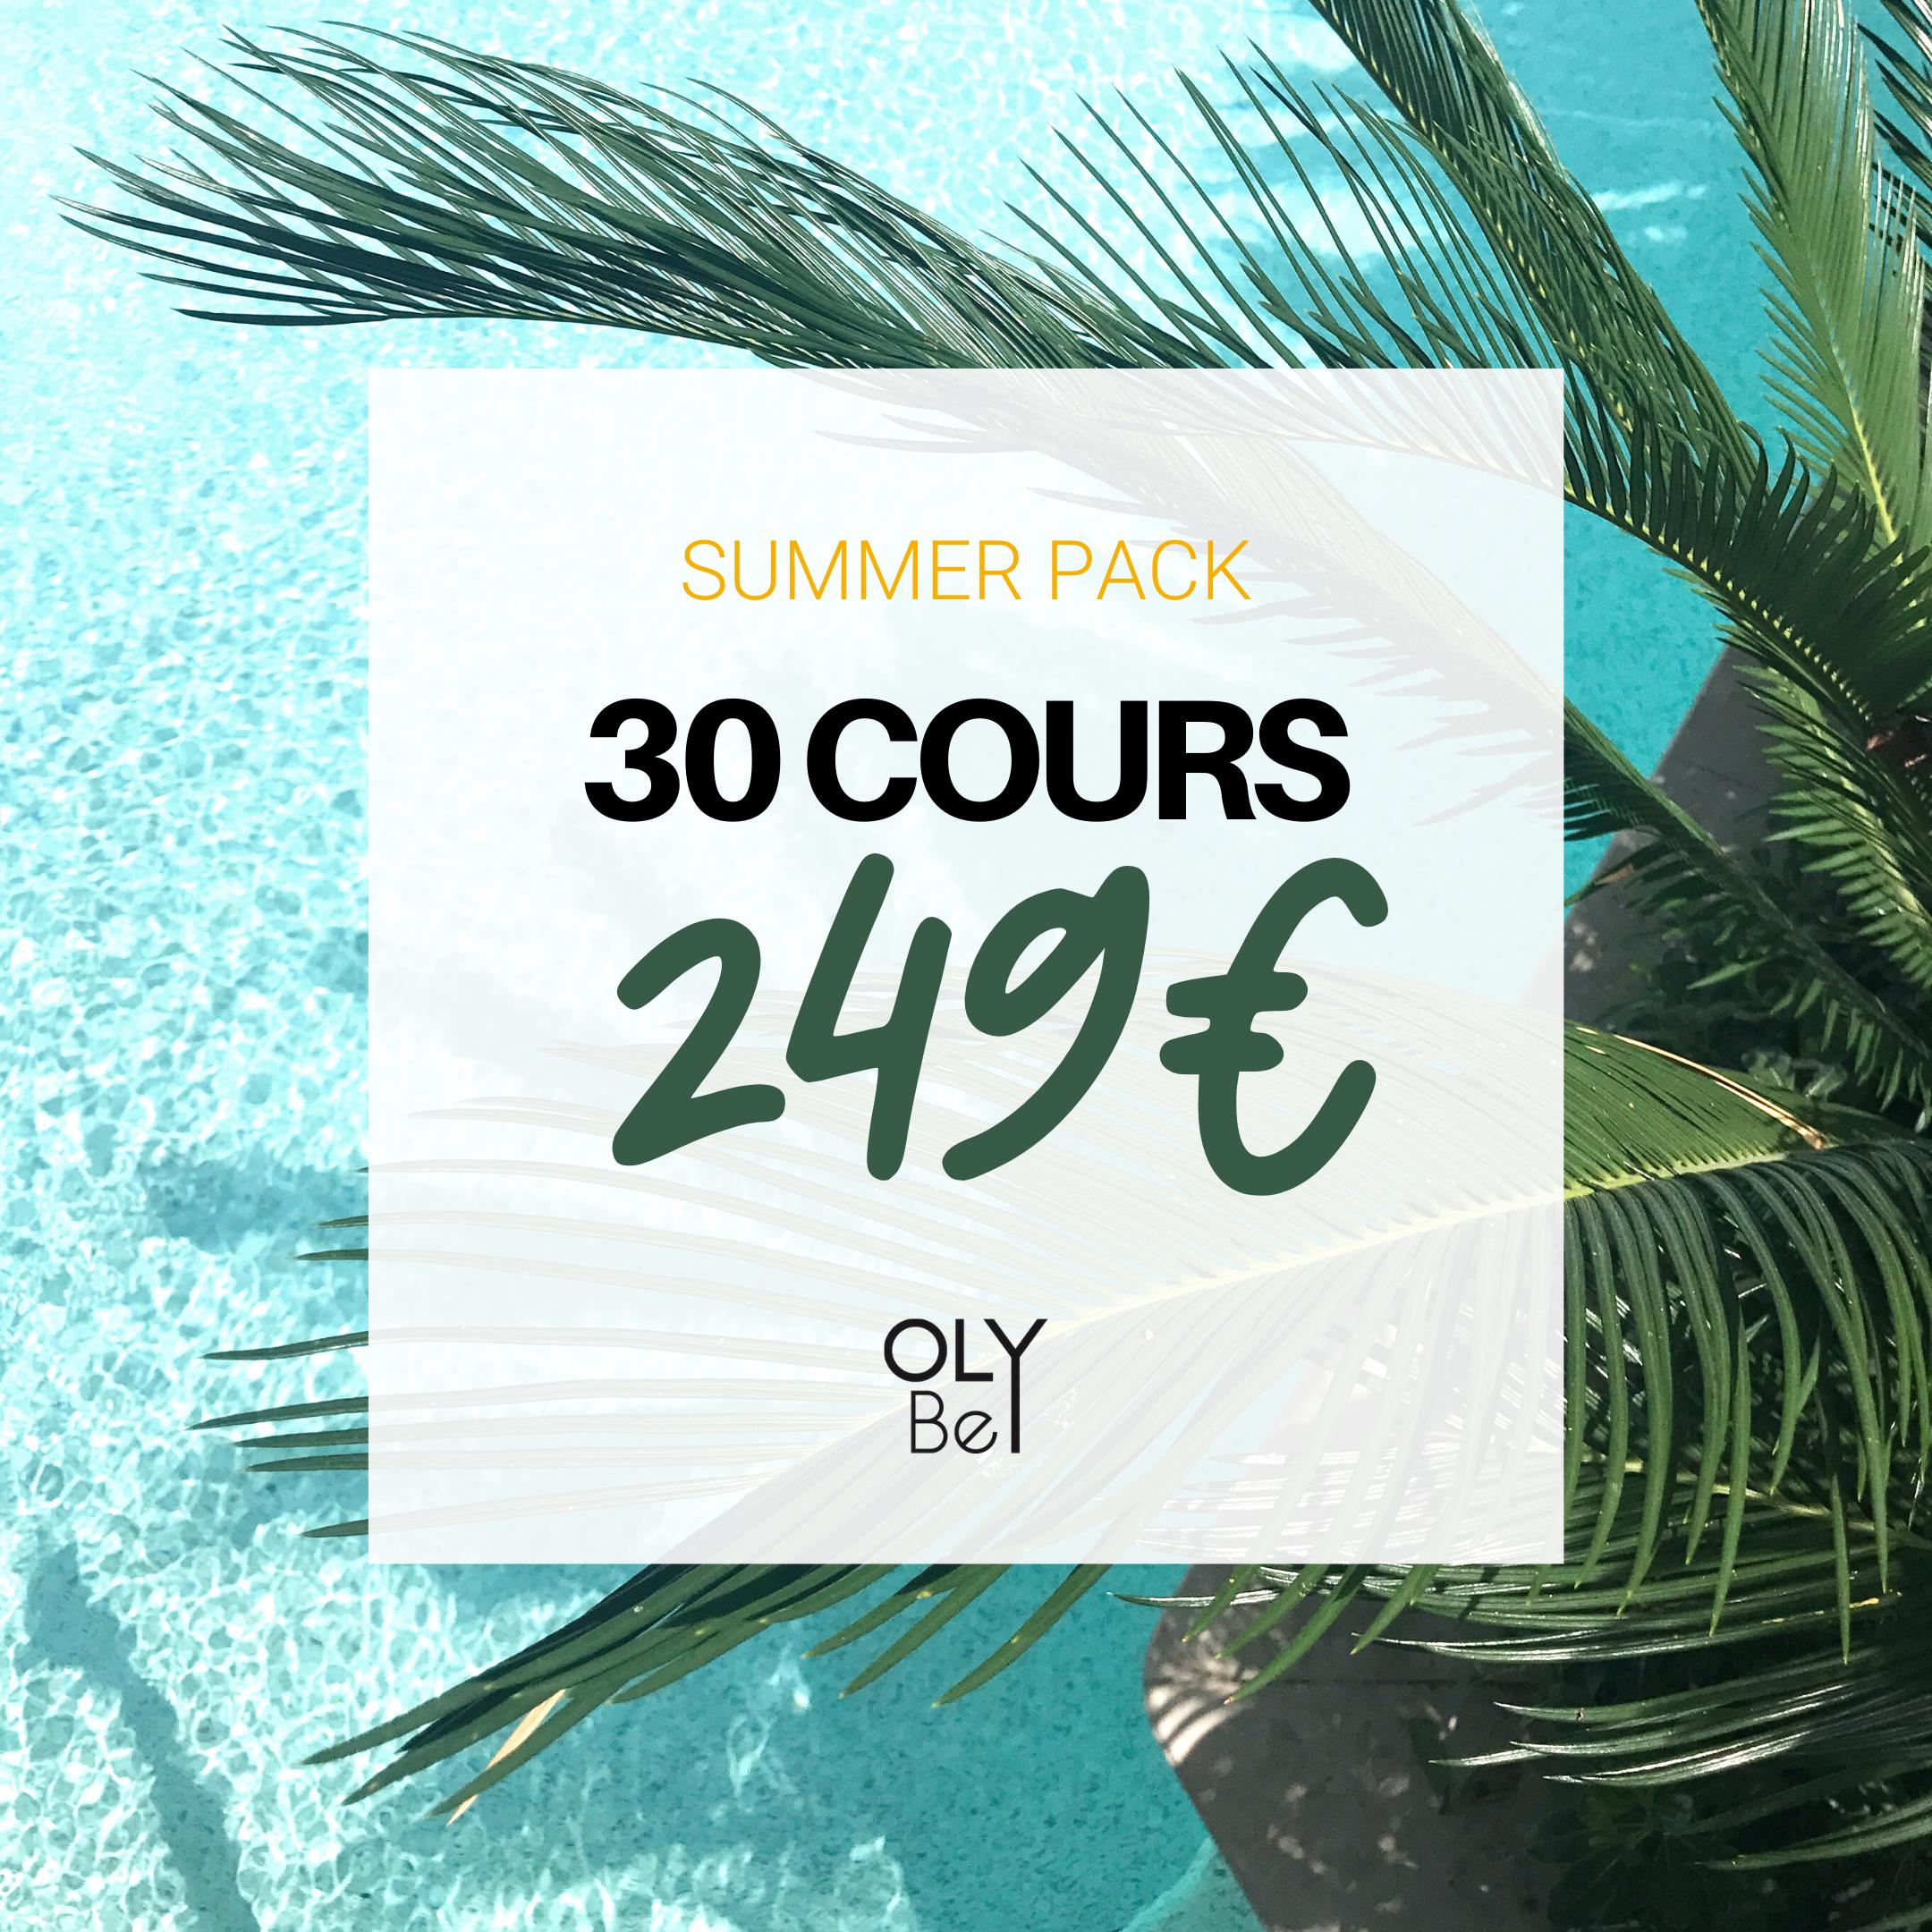 30 COURS =  249€   💥 Soit  8,3€ le cours !  📆 Valable  12 mois